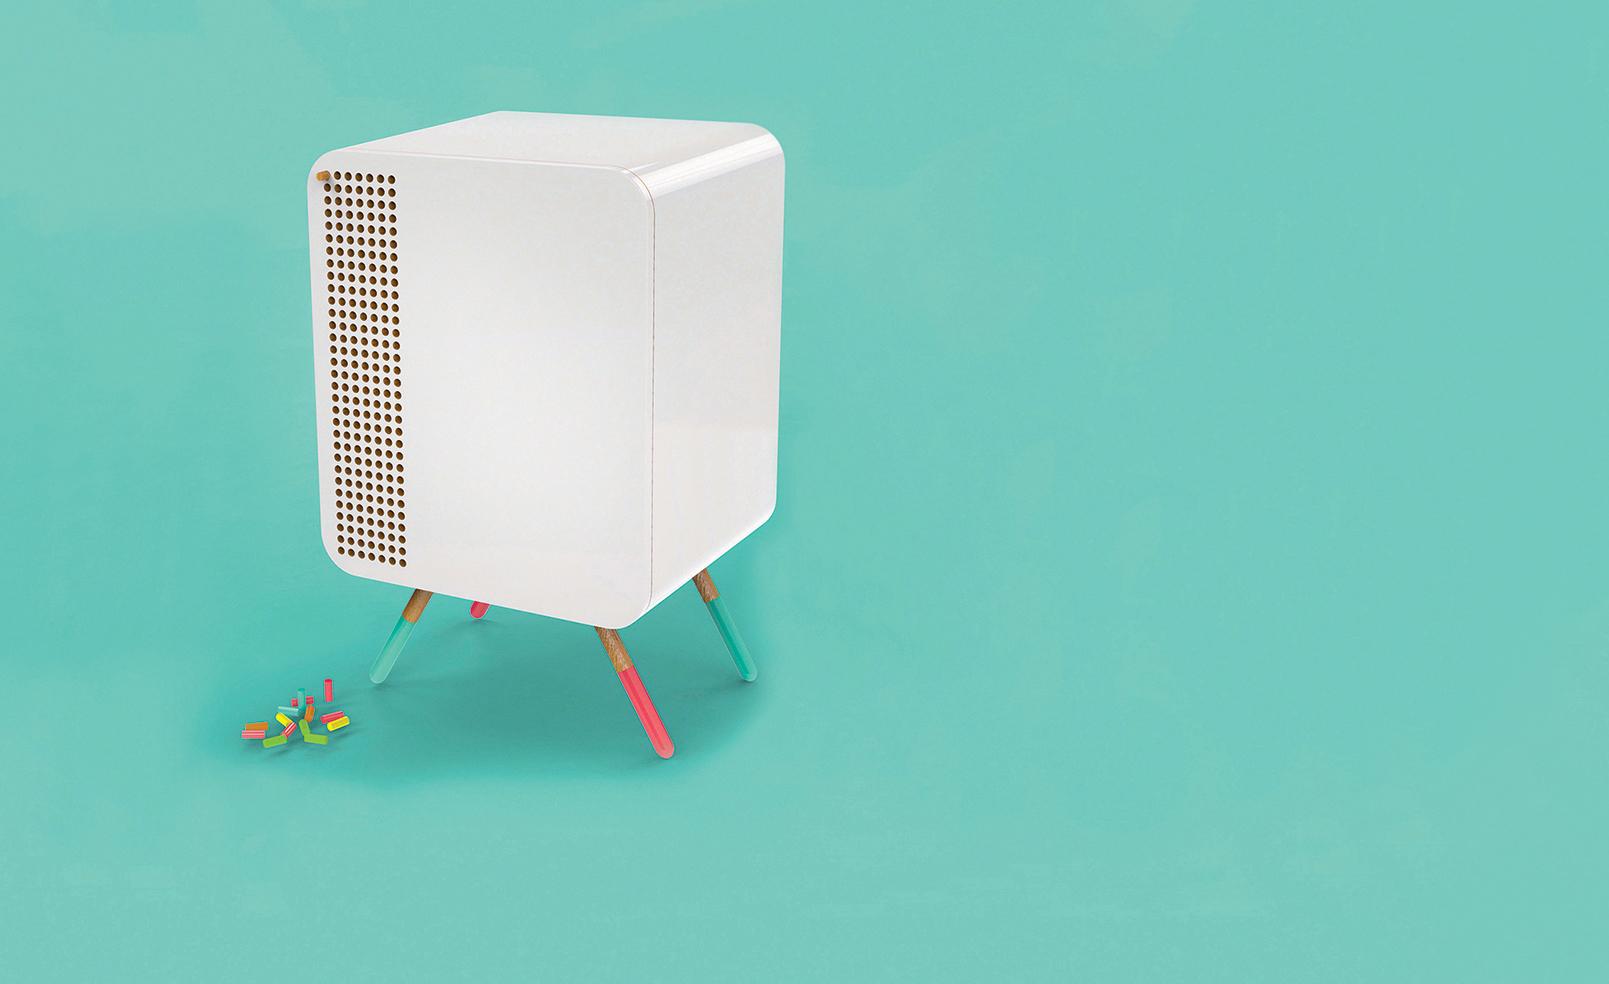 wci-cho-furniture-set-for-children-pawlowska-design-visualization-2